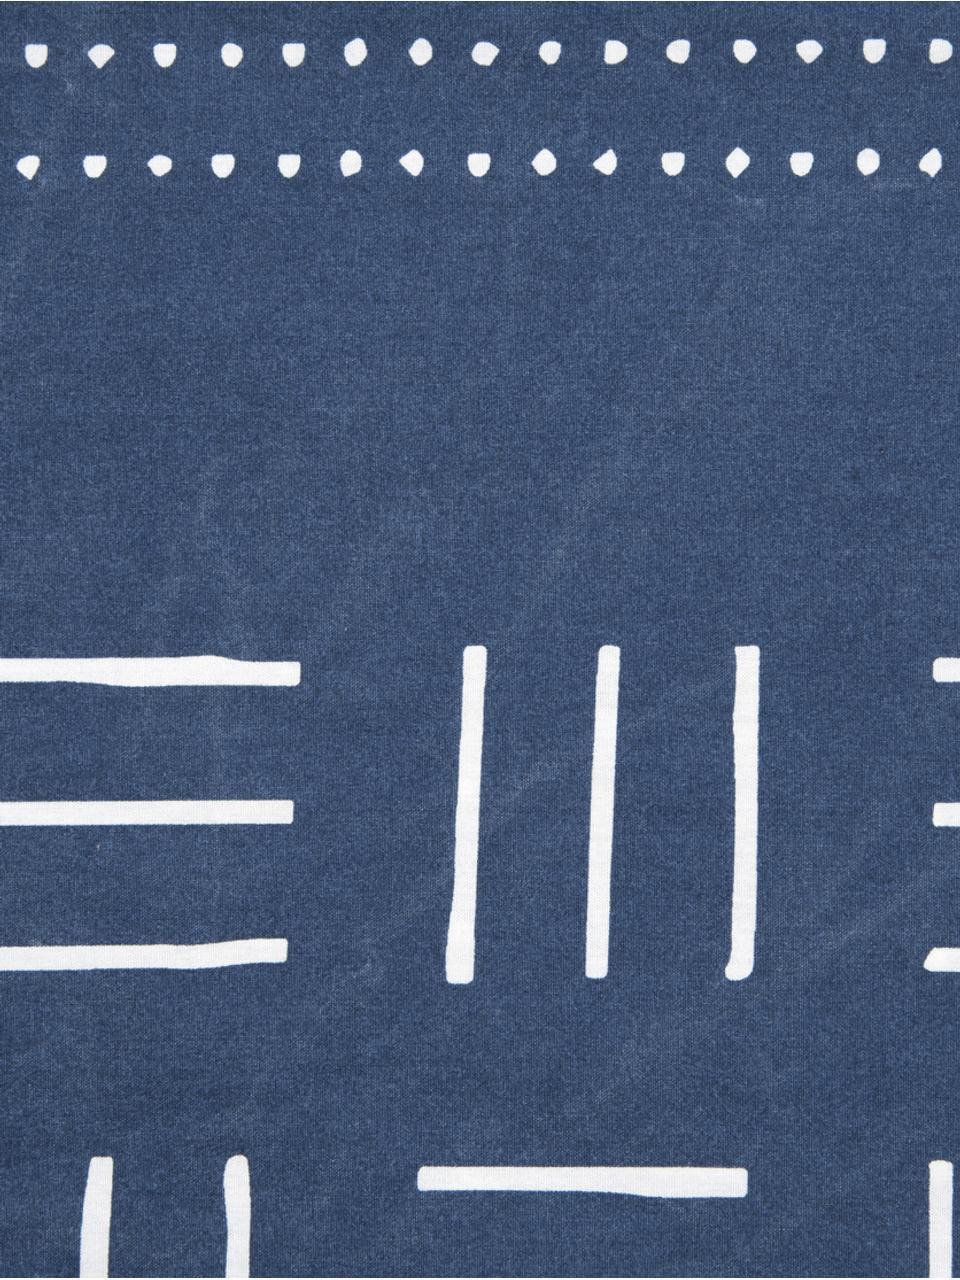 Gewaschene Baumwoll-Bettwäsche Kohana im Boho Style, Webart: Perkal Fadendichte 180 TC, Dunkelblau, Ecru, 240 x 220 cm + 2 Kissen 80 x 80 cm